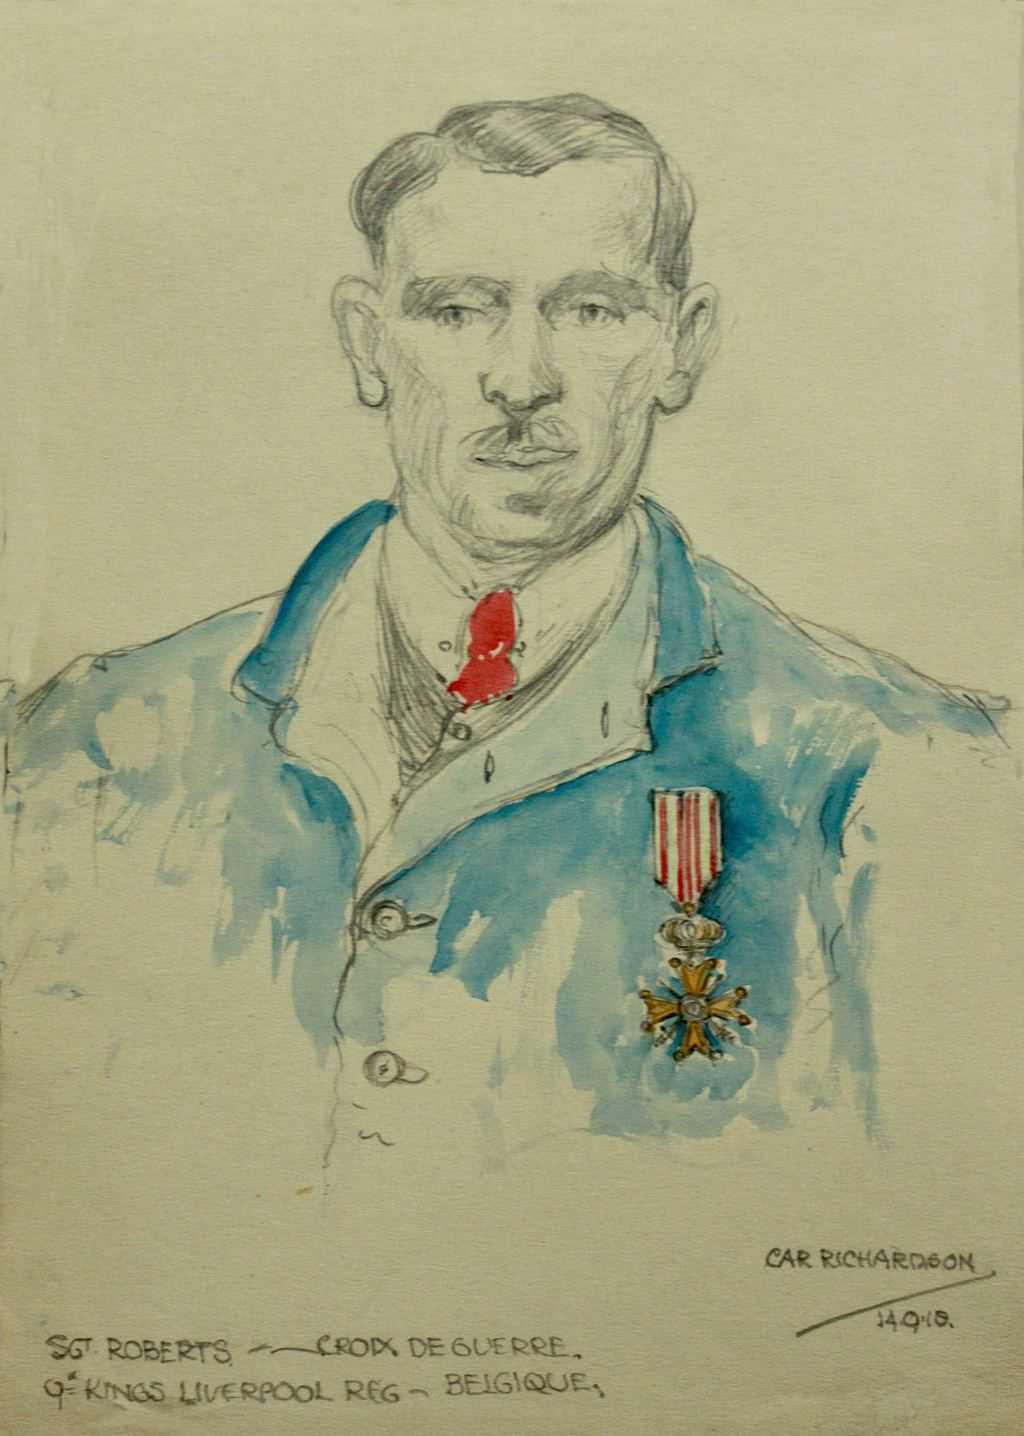 Sketch of Sgt ROBERTS 9th Kings Liverpool Reg. / Croix de Guerre Belgique / dated 14.9.18